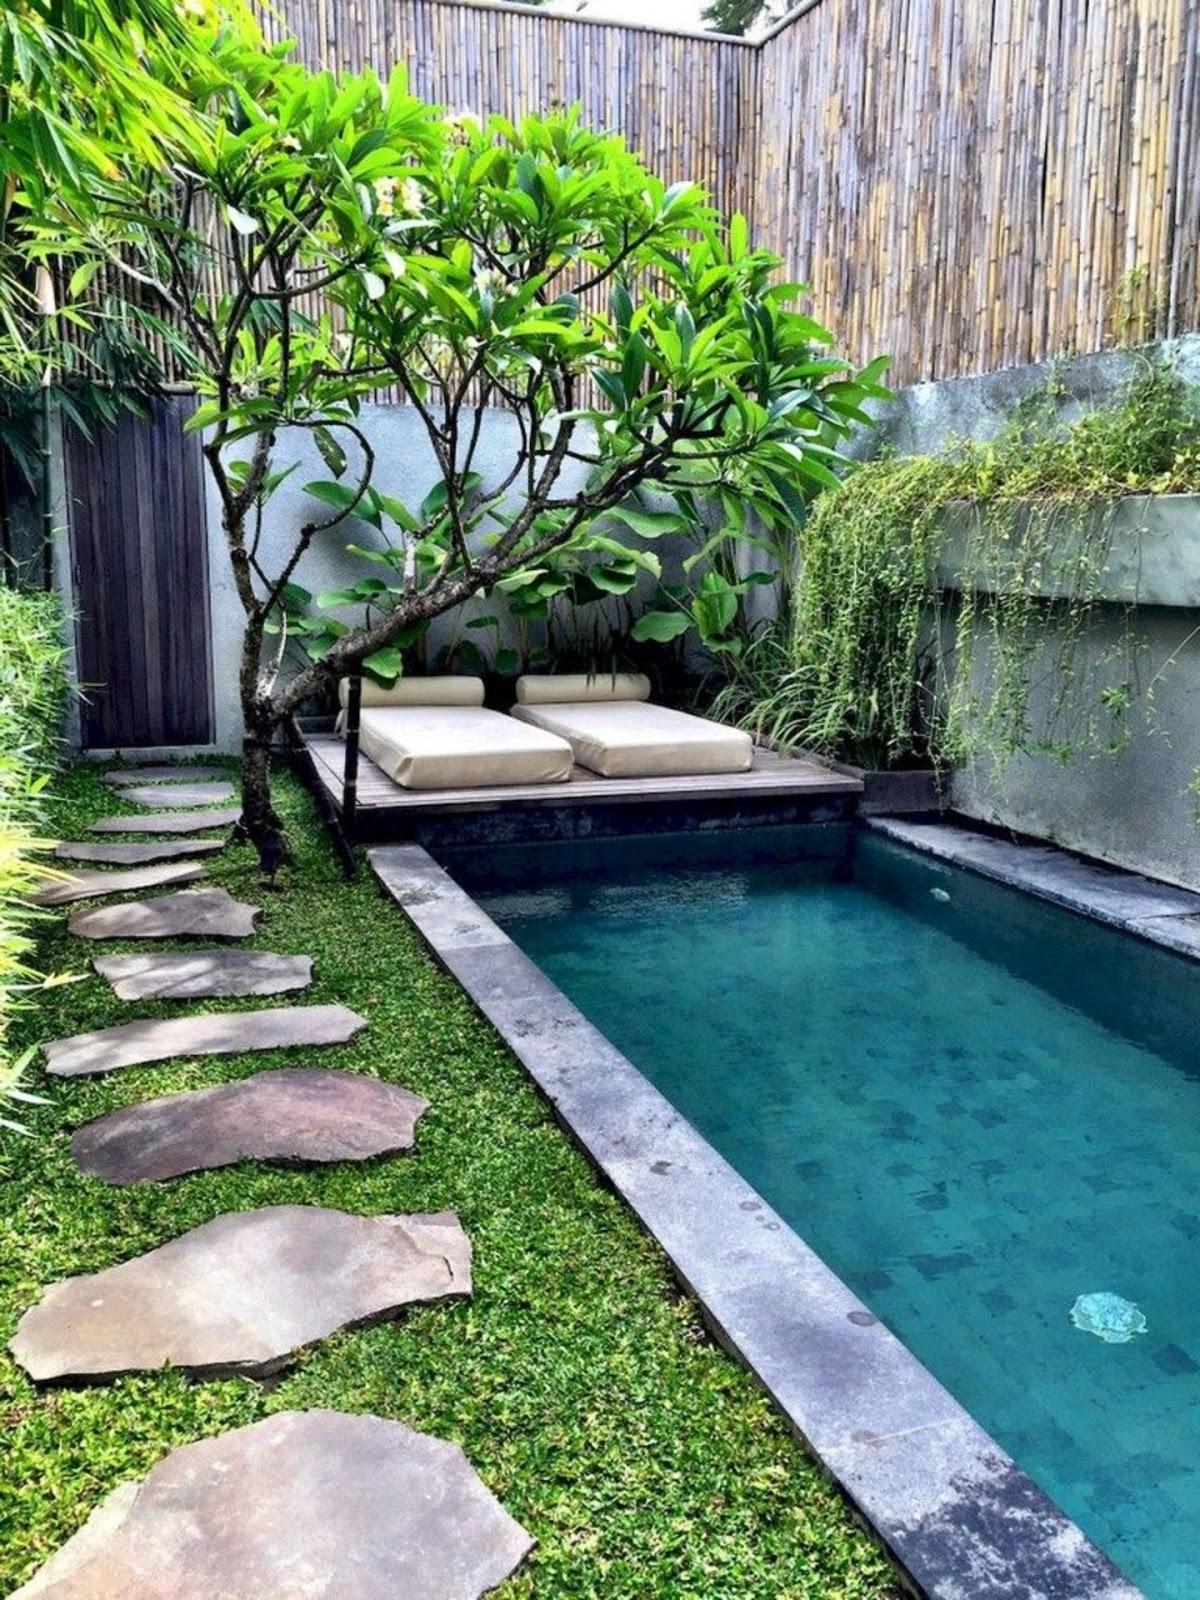 Amazing Small Garden Design to Beautify Your Backyard